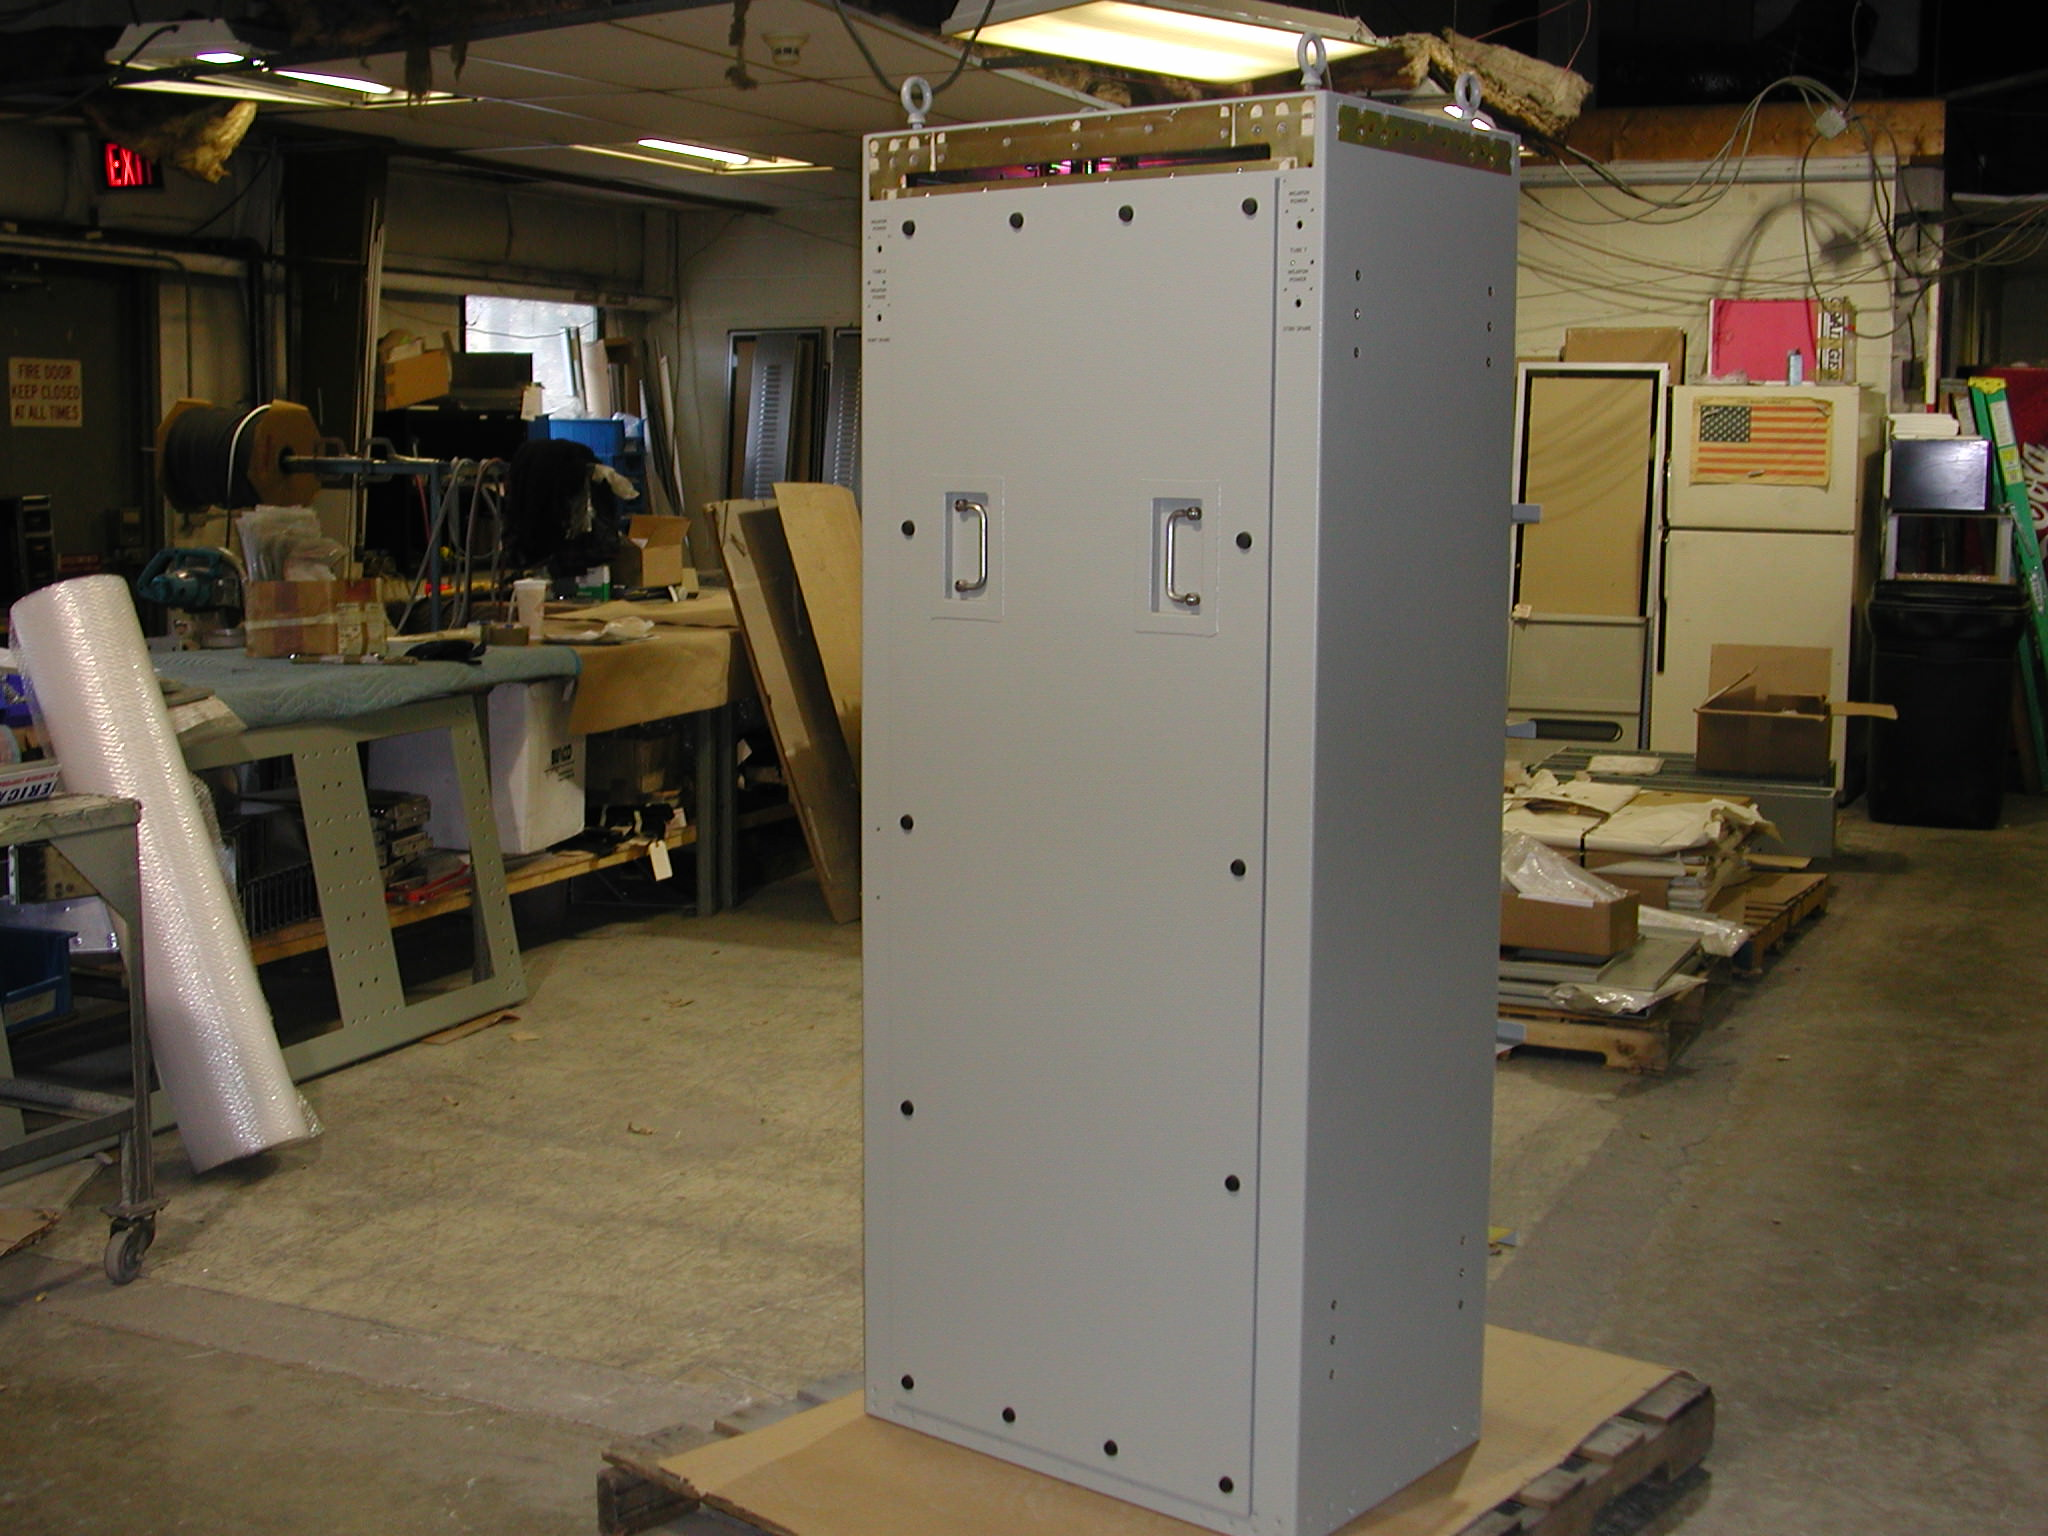 Metal Enclosures Millitary Hopewell Precision NY DSCN1670.JPG